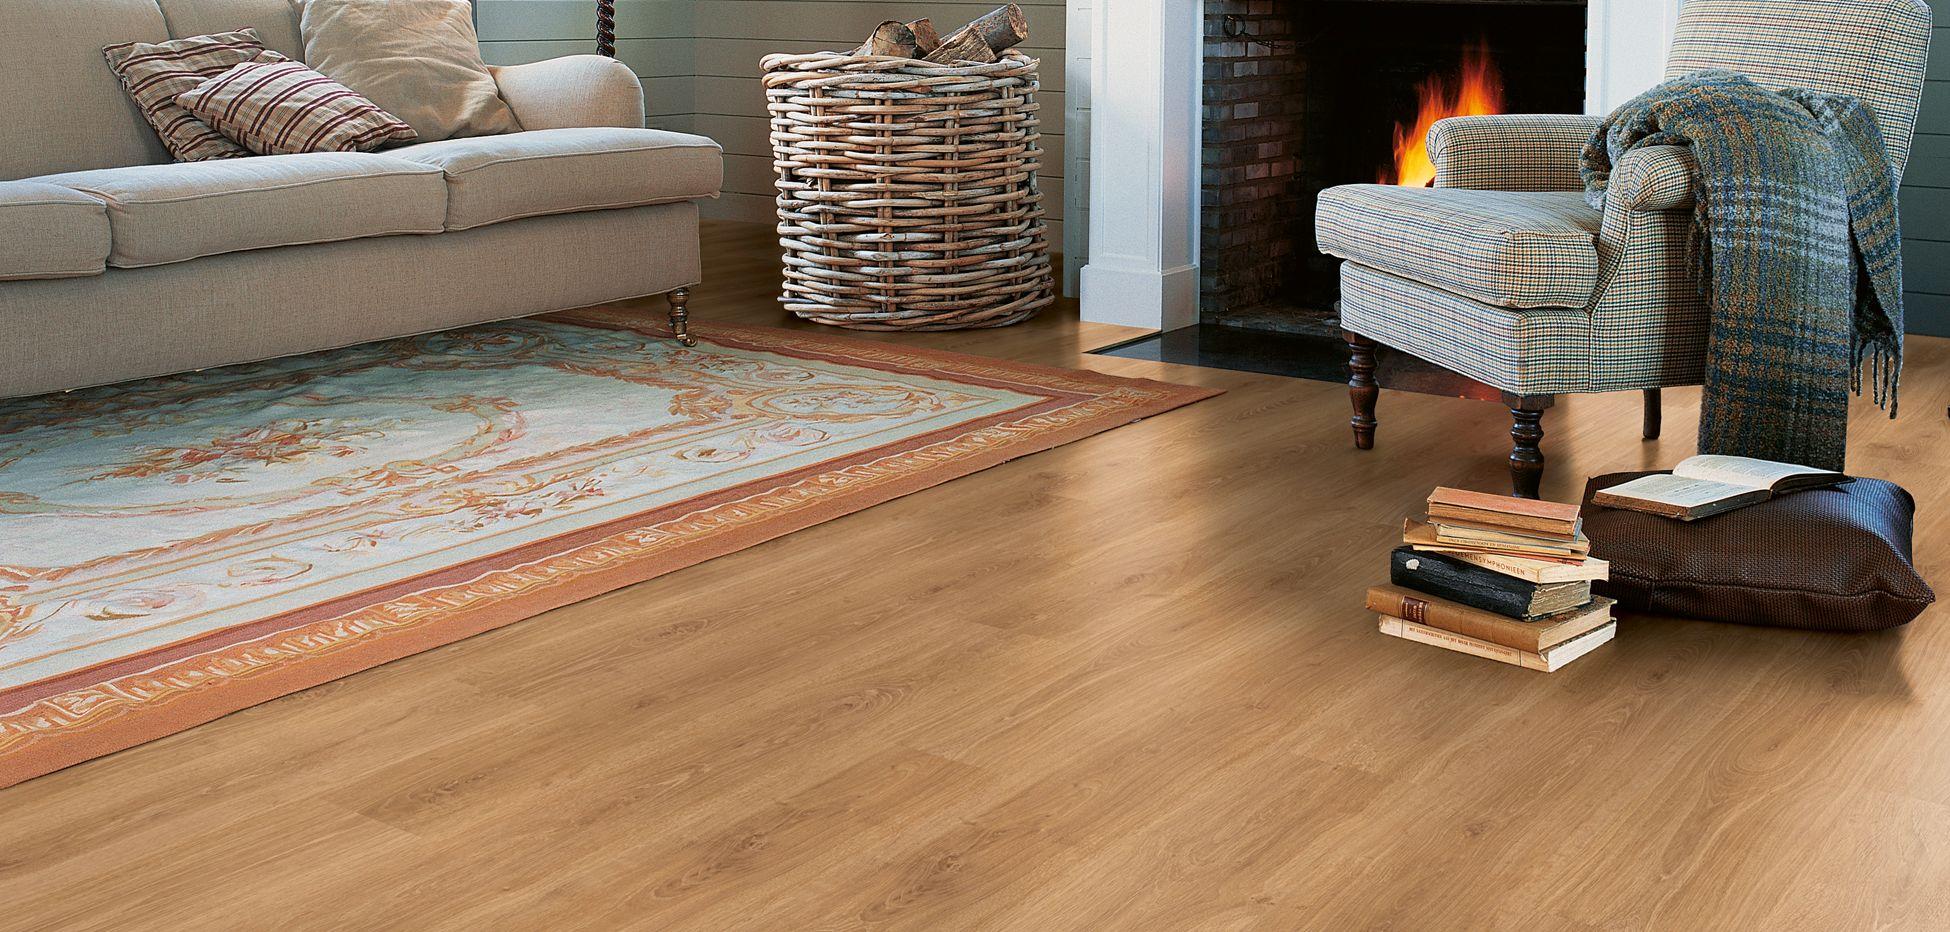 sàn gỗ malaysia sàn gỗ cao cấp